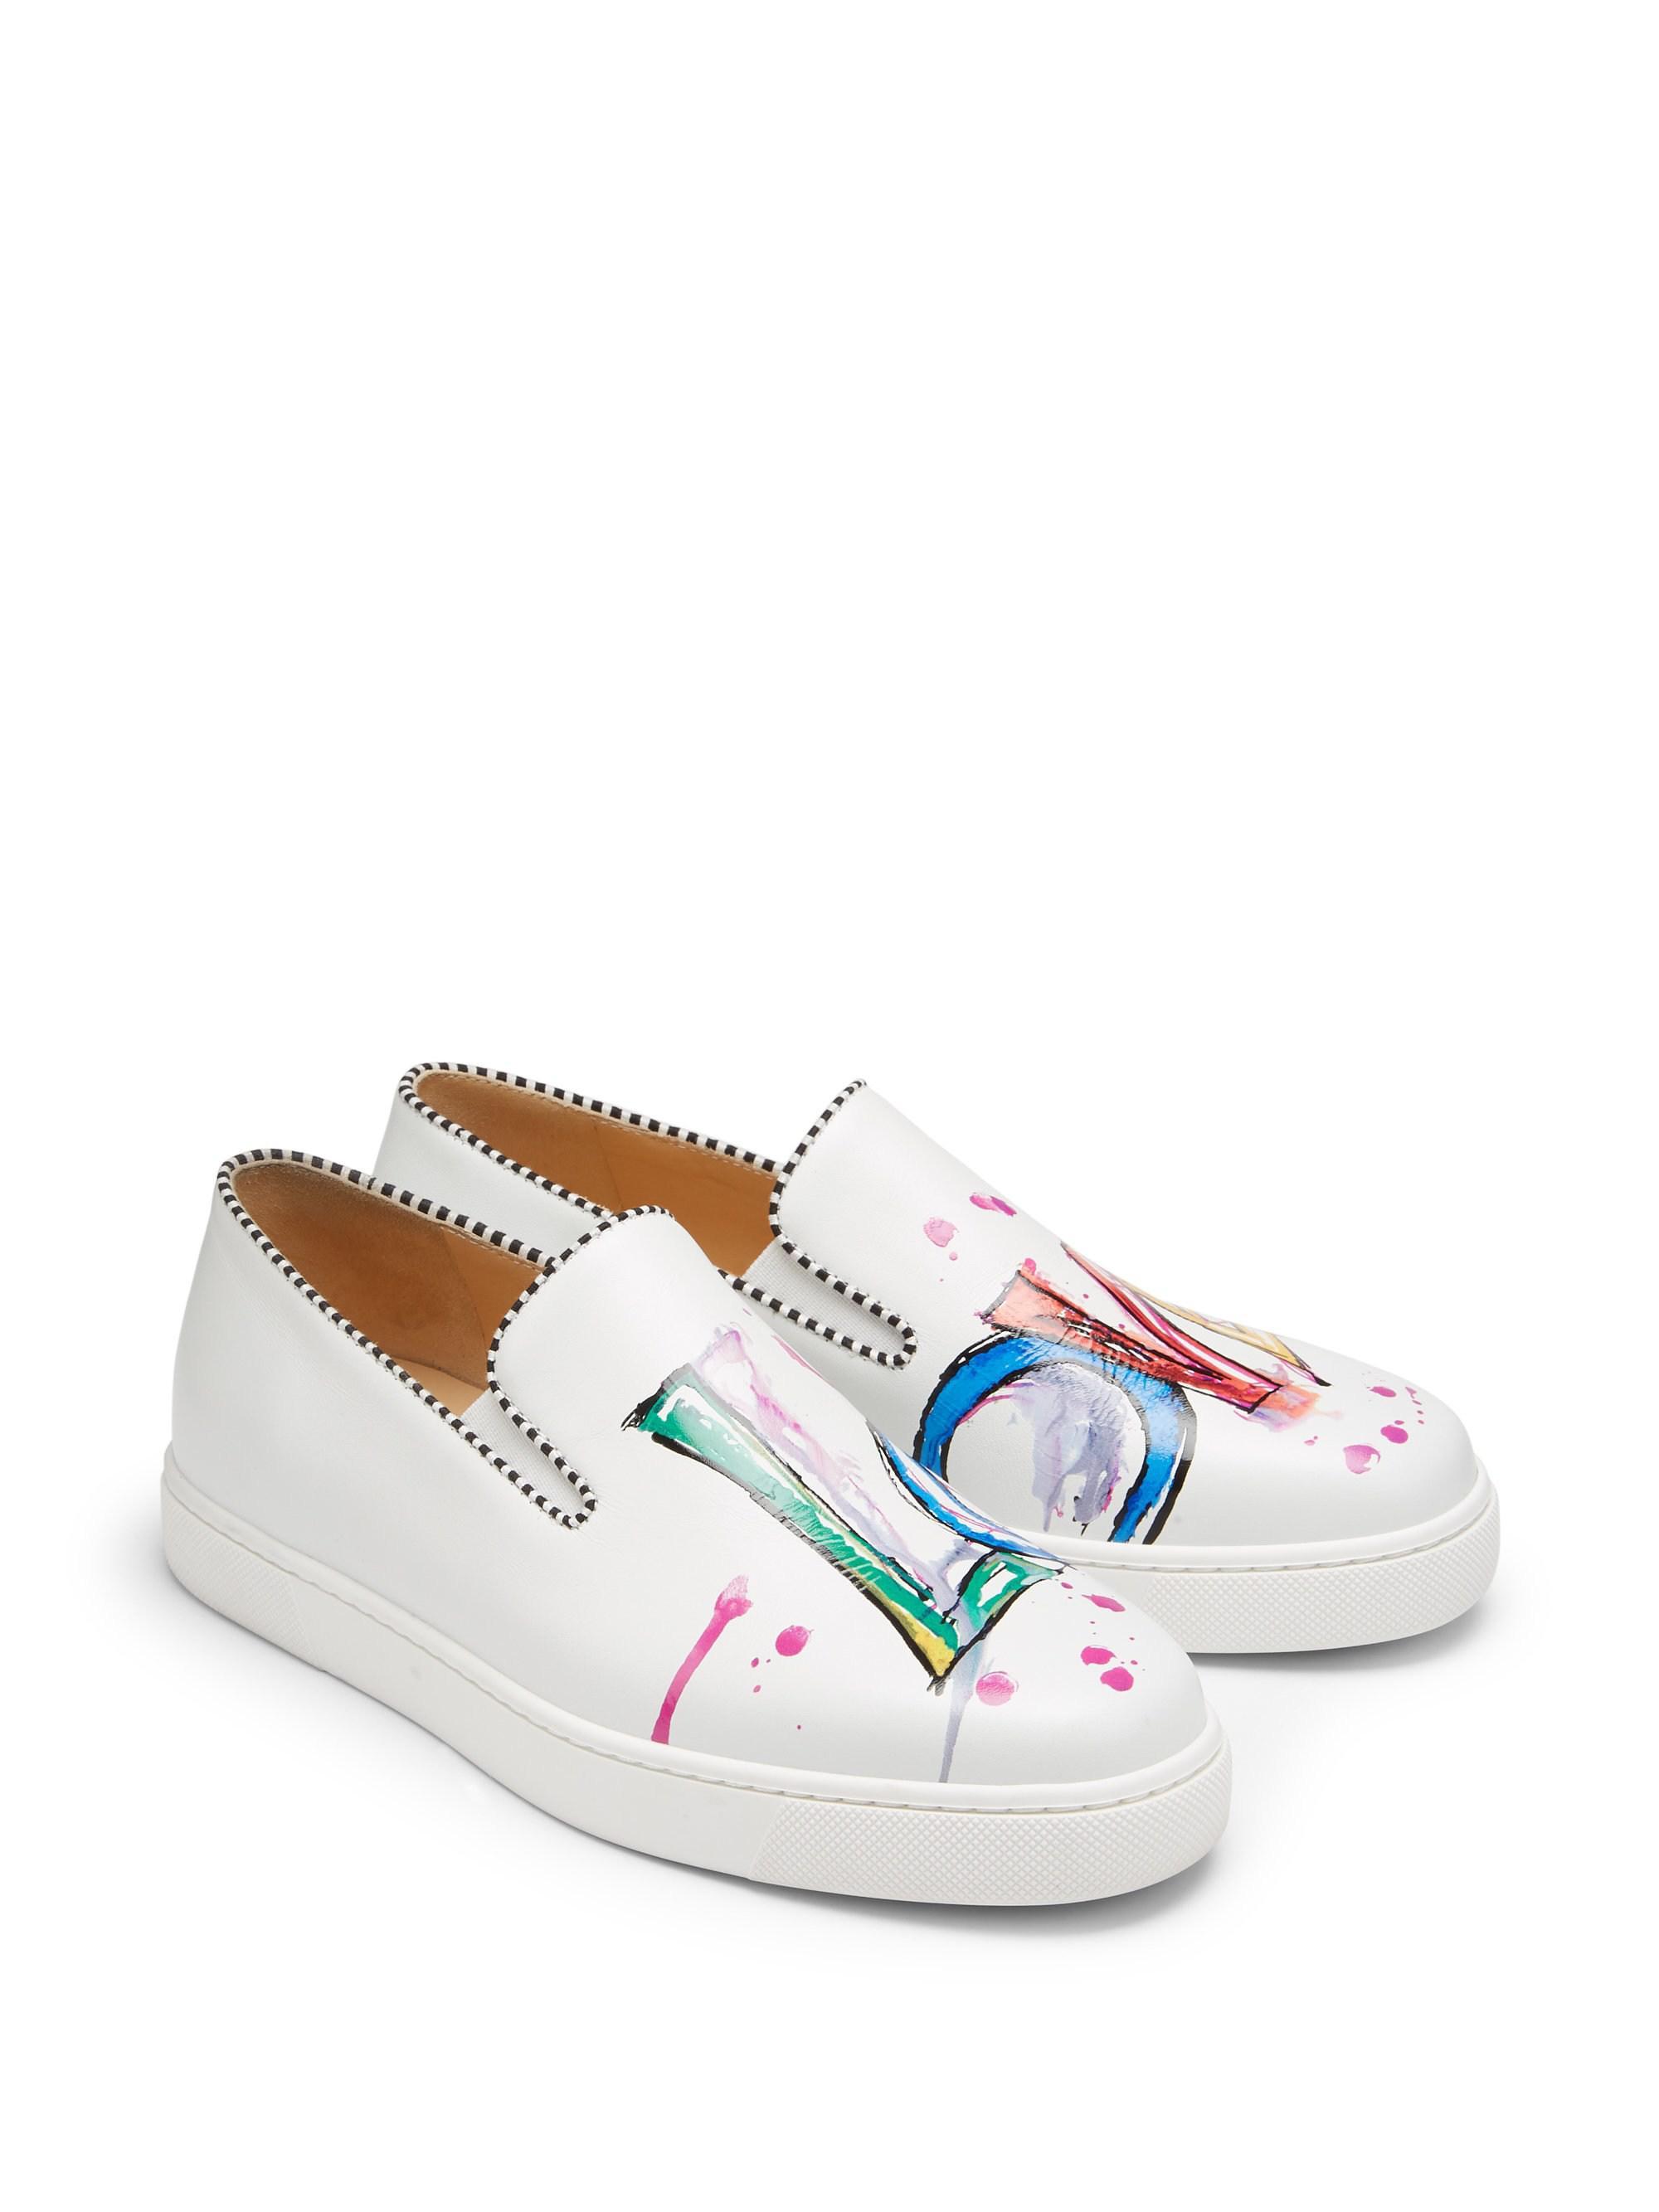 0761e2868b0 Lyst - Christian Louboutin Loubi Love Leather Sneakers in White